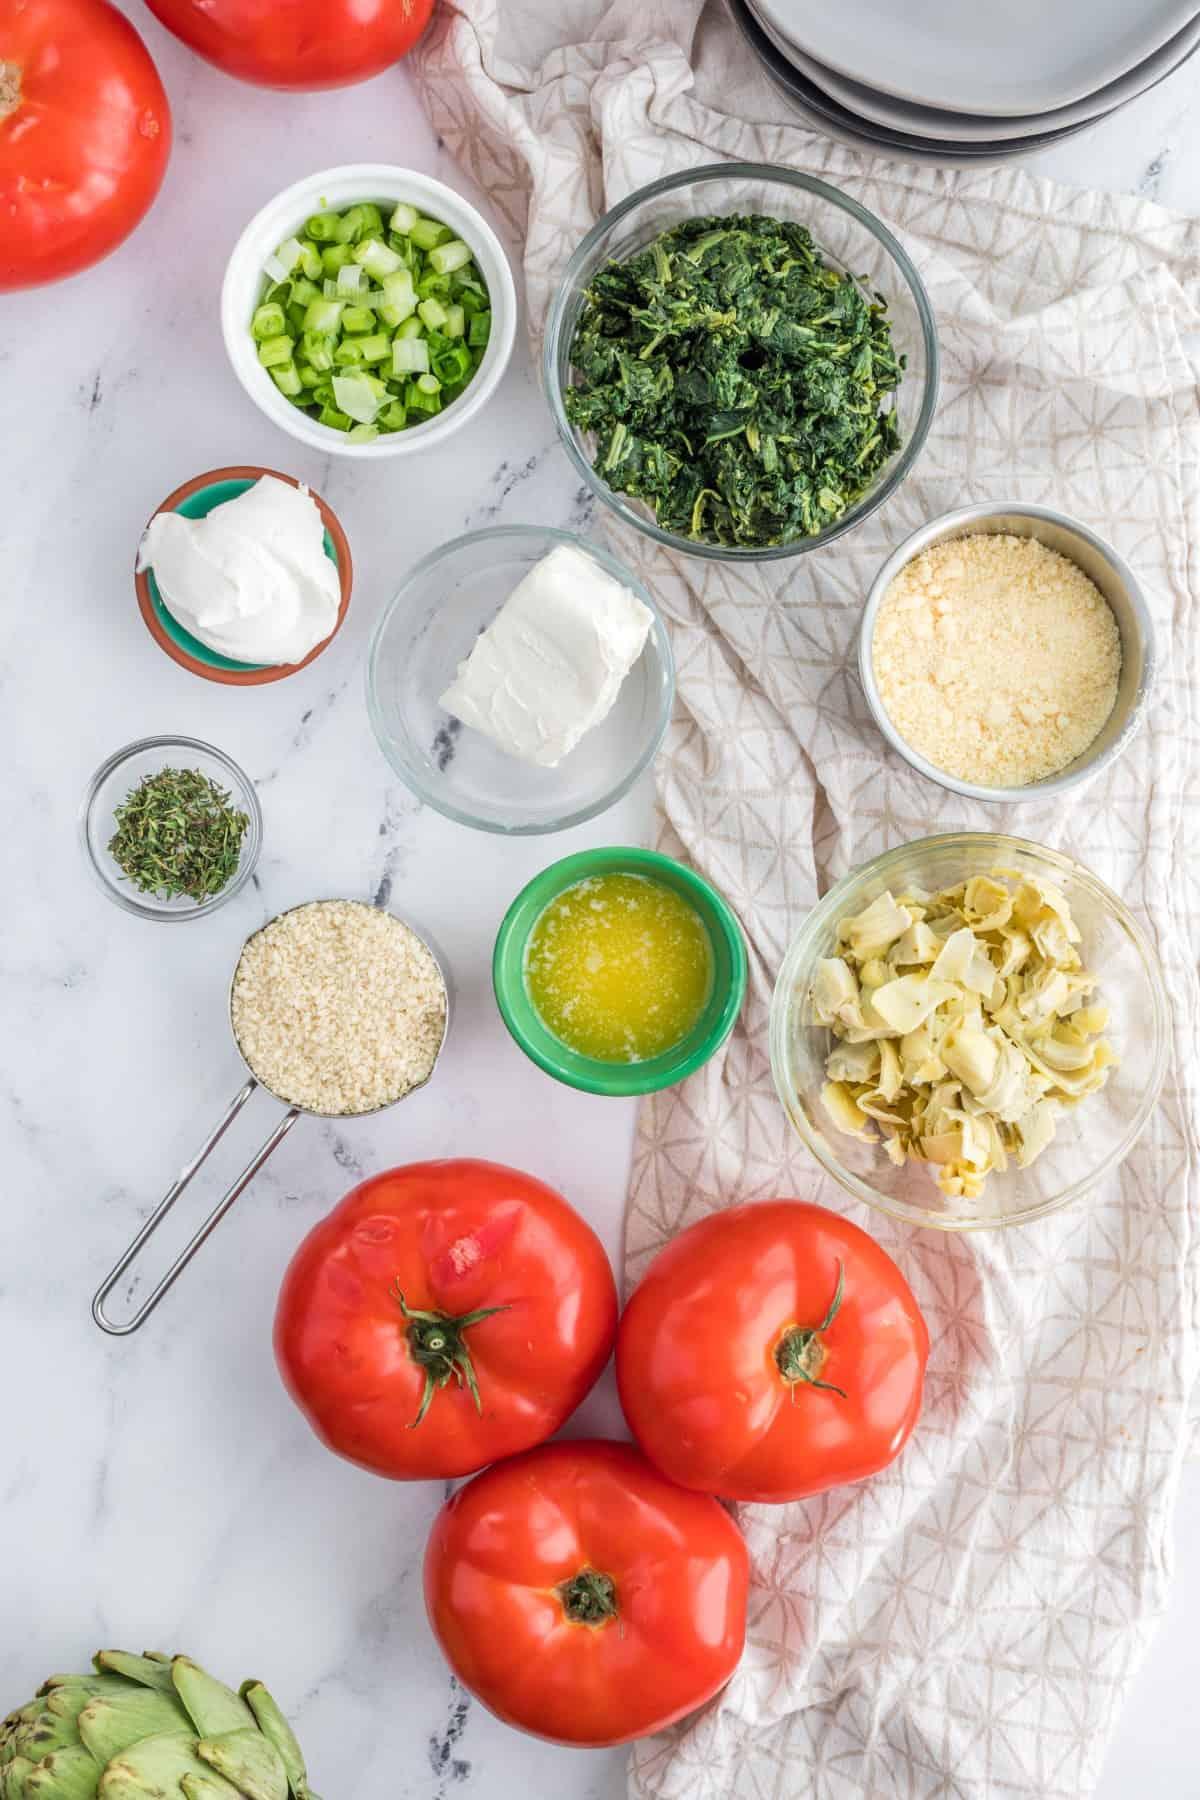 Ingredients for Artichoke Stuffed Tomatoes